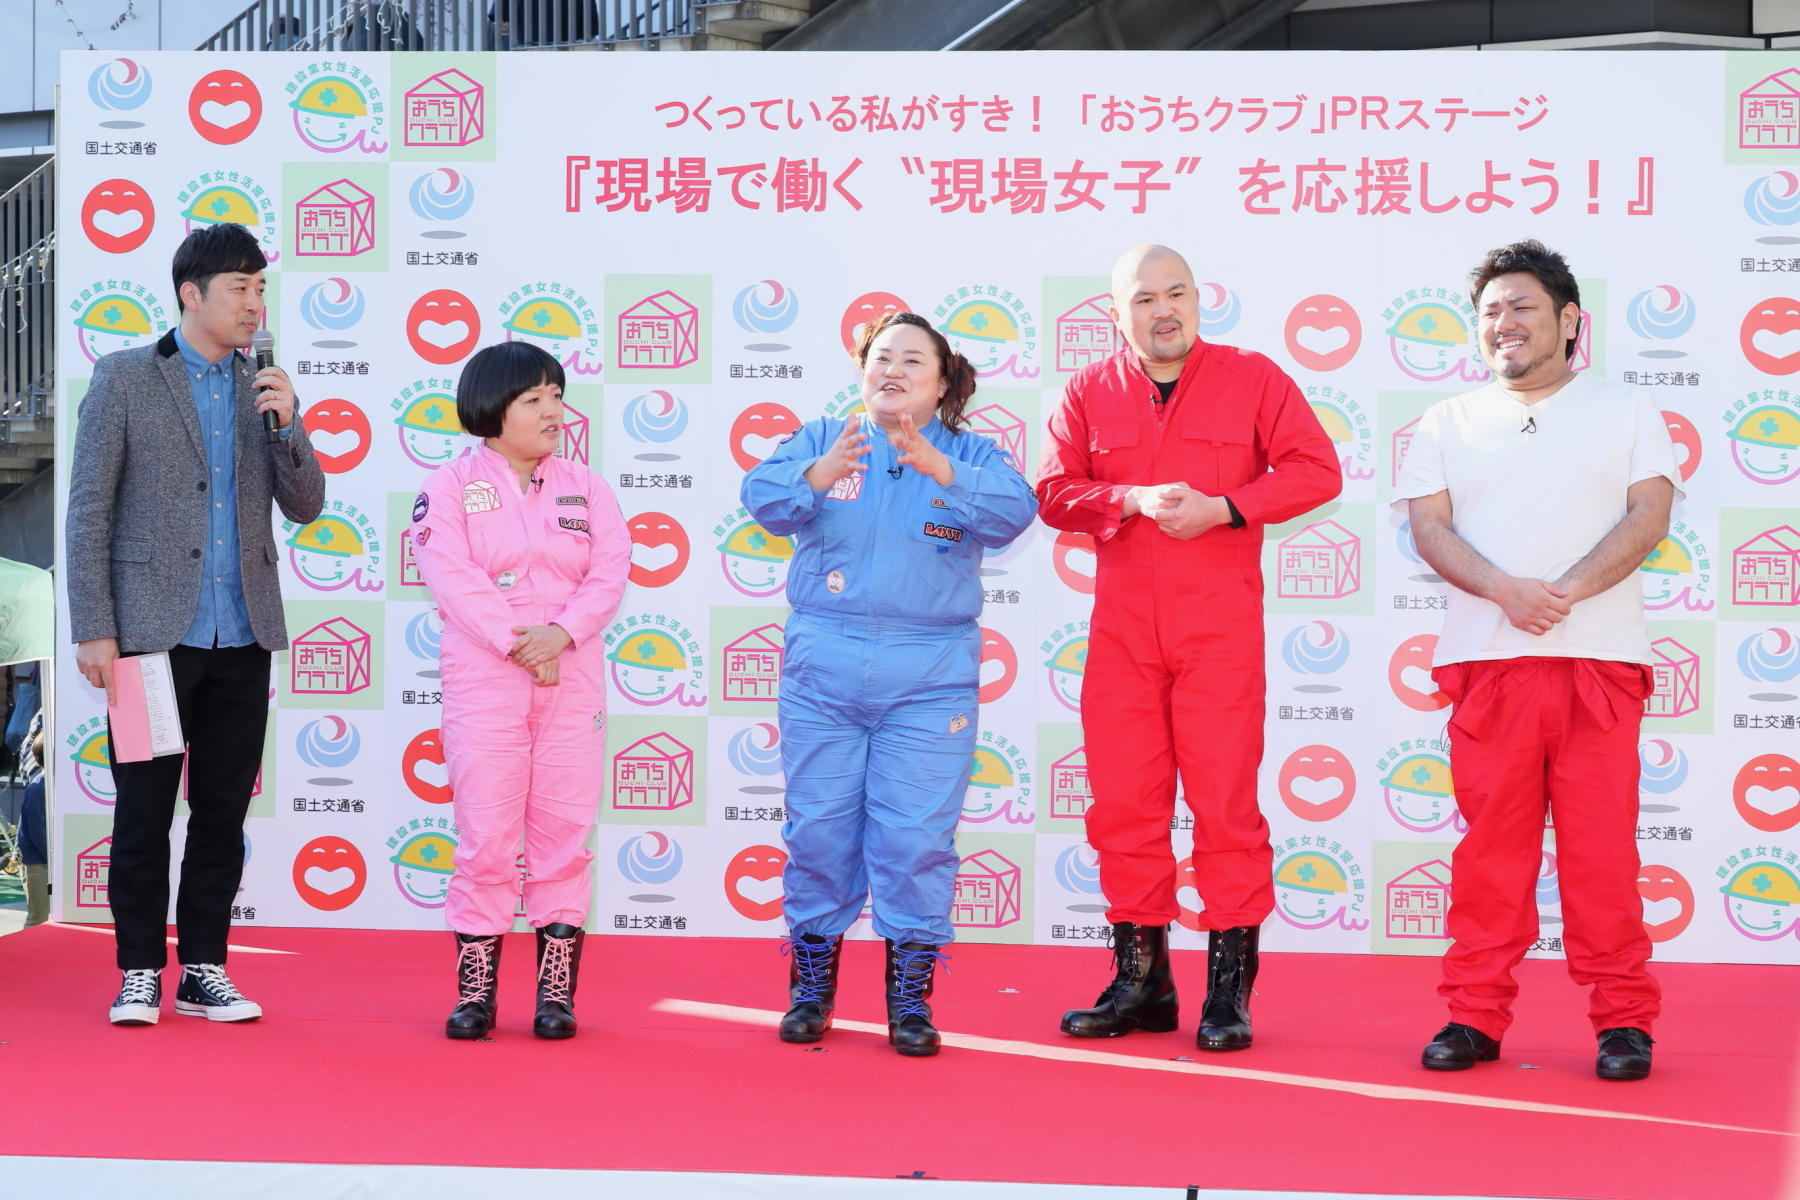 http://news.yoshimoto.co.jp/20170226095311-3fa454808fec003427385f368958c4980adc4927.jpg